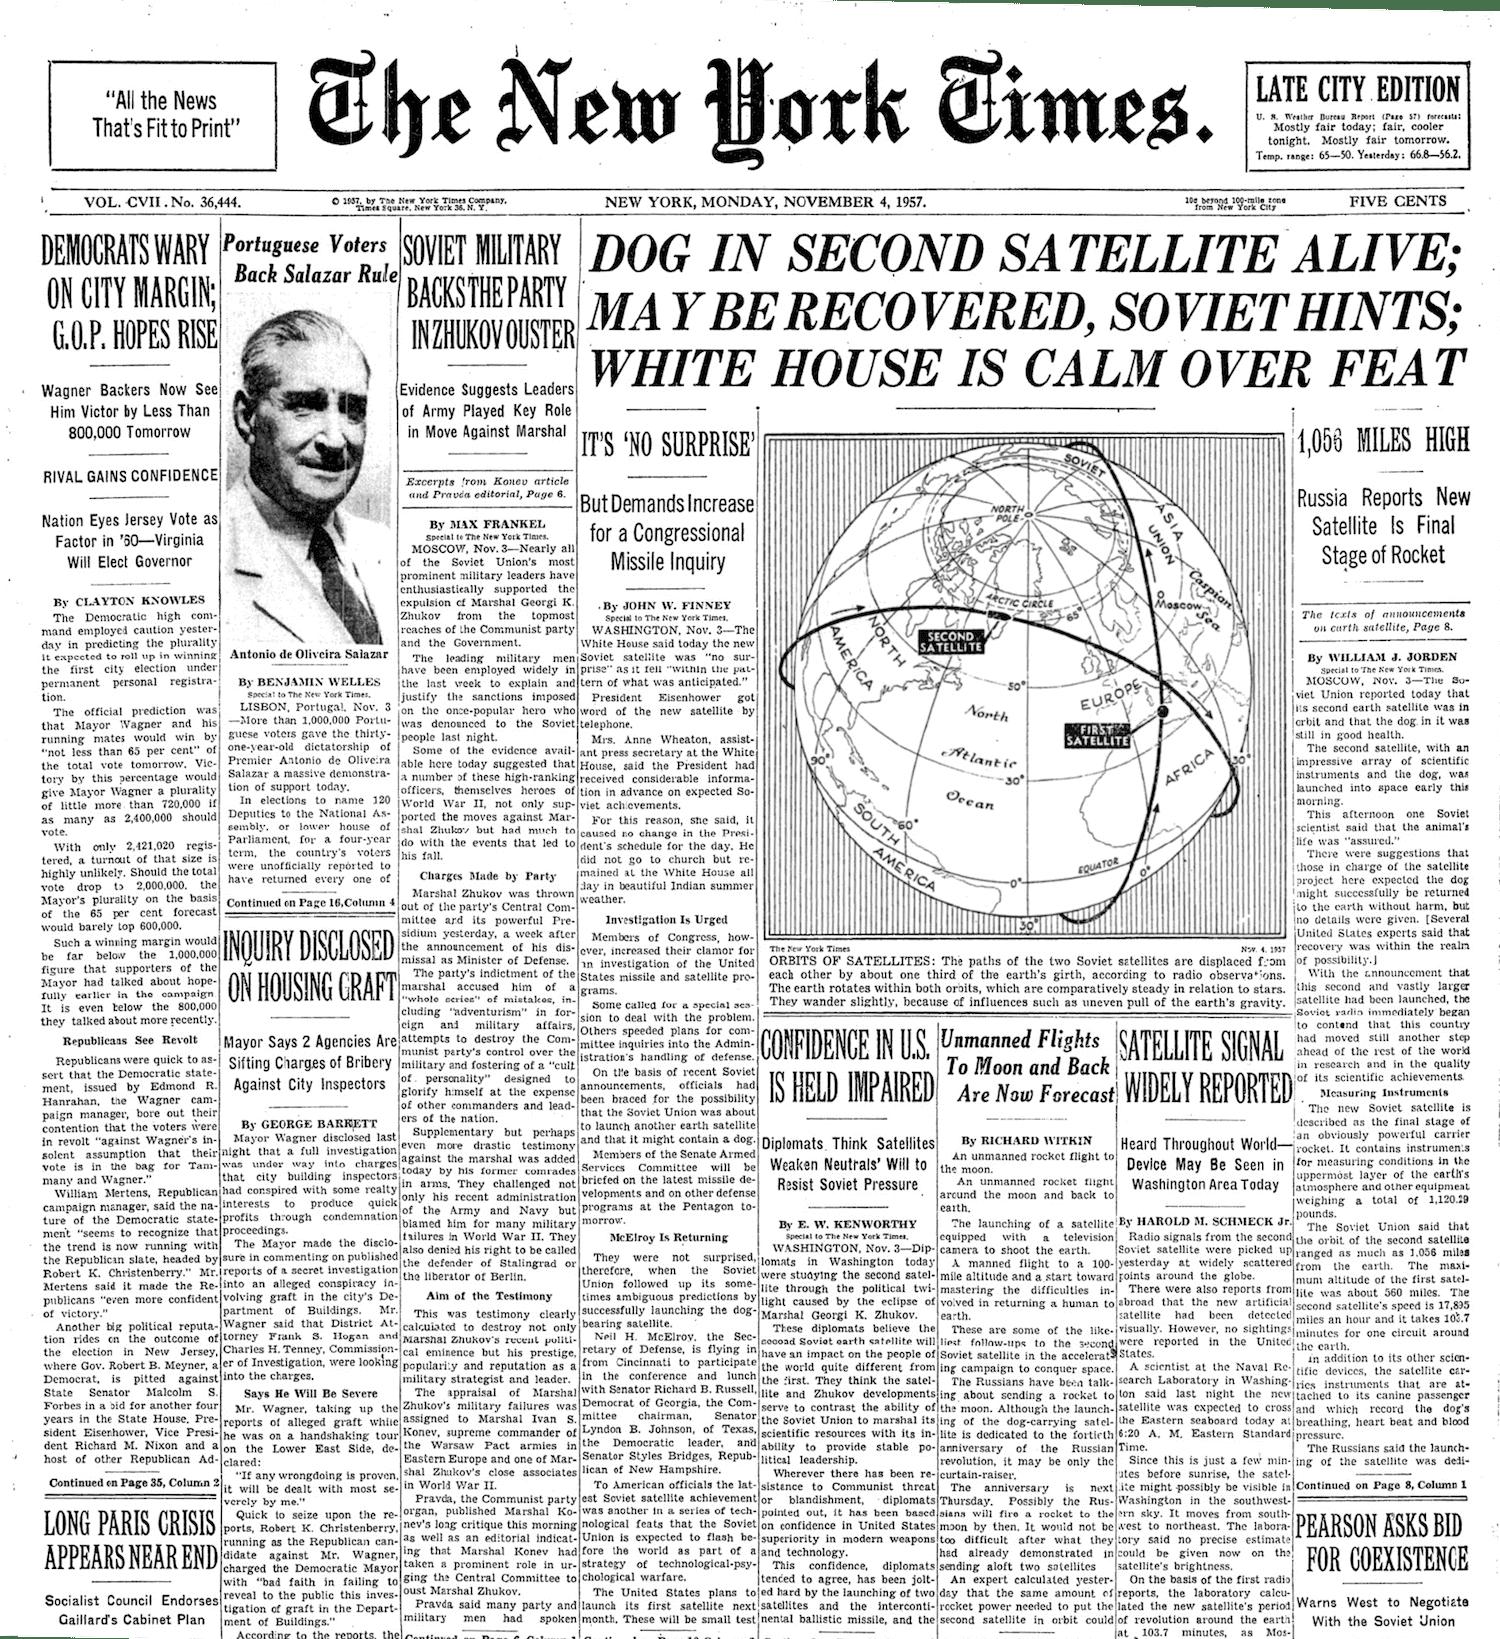 Image NY Times Sputnik 2 NOV 4 1957